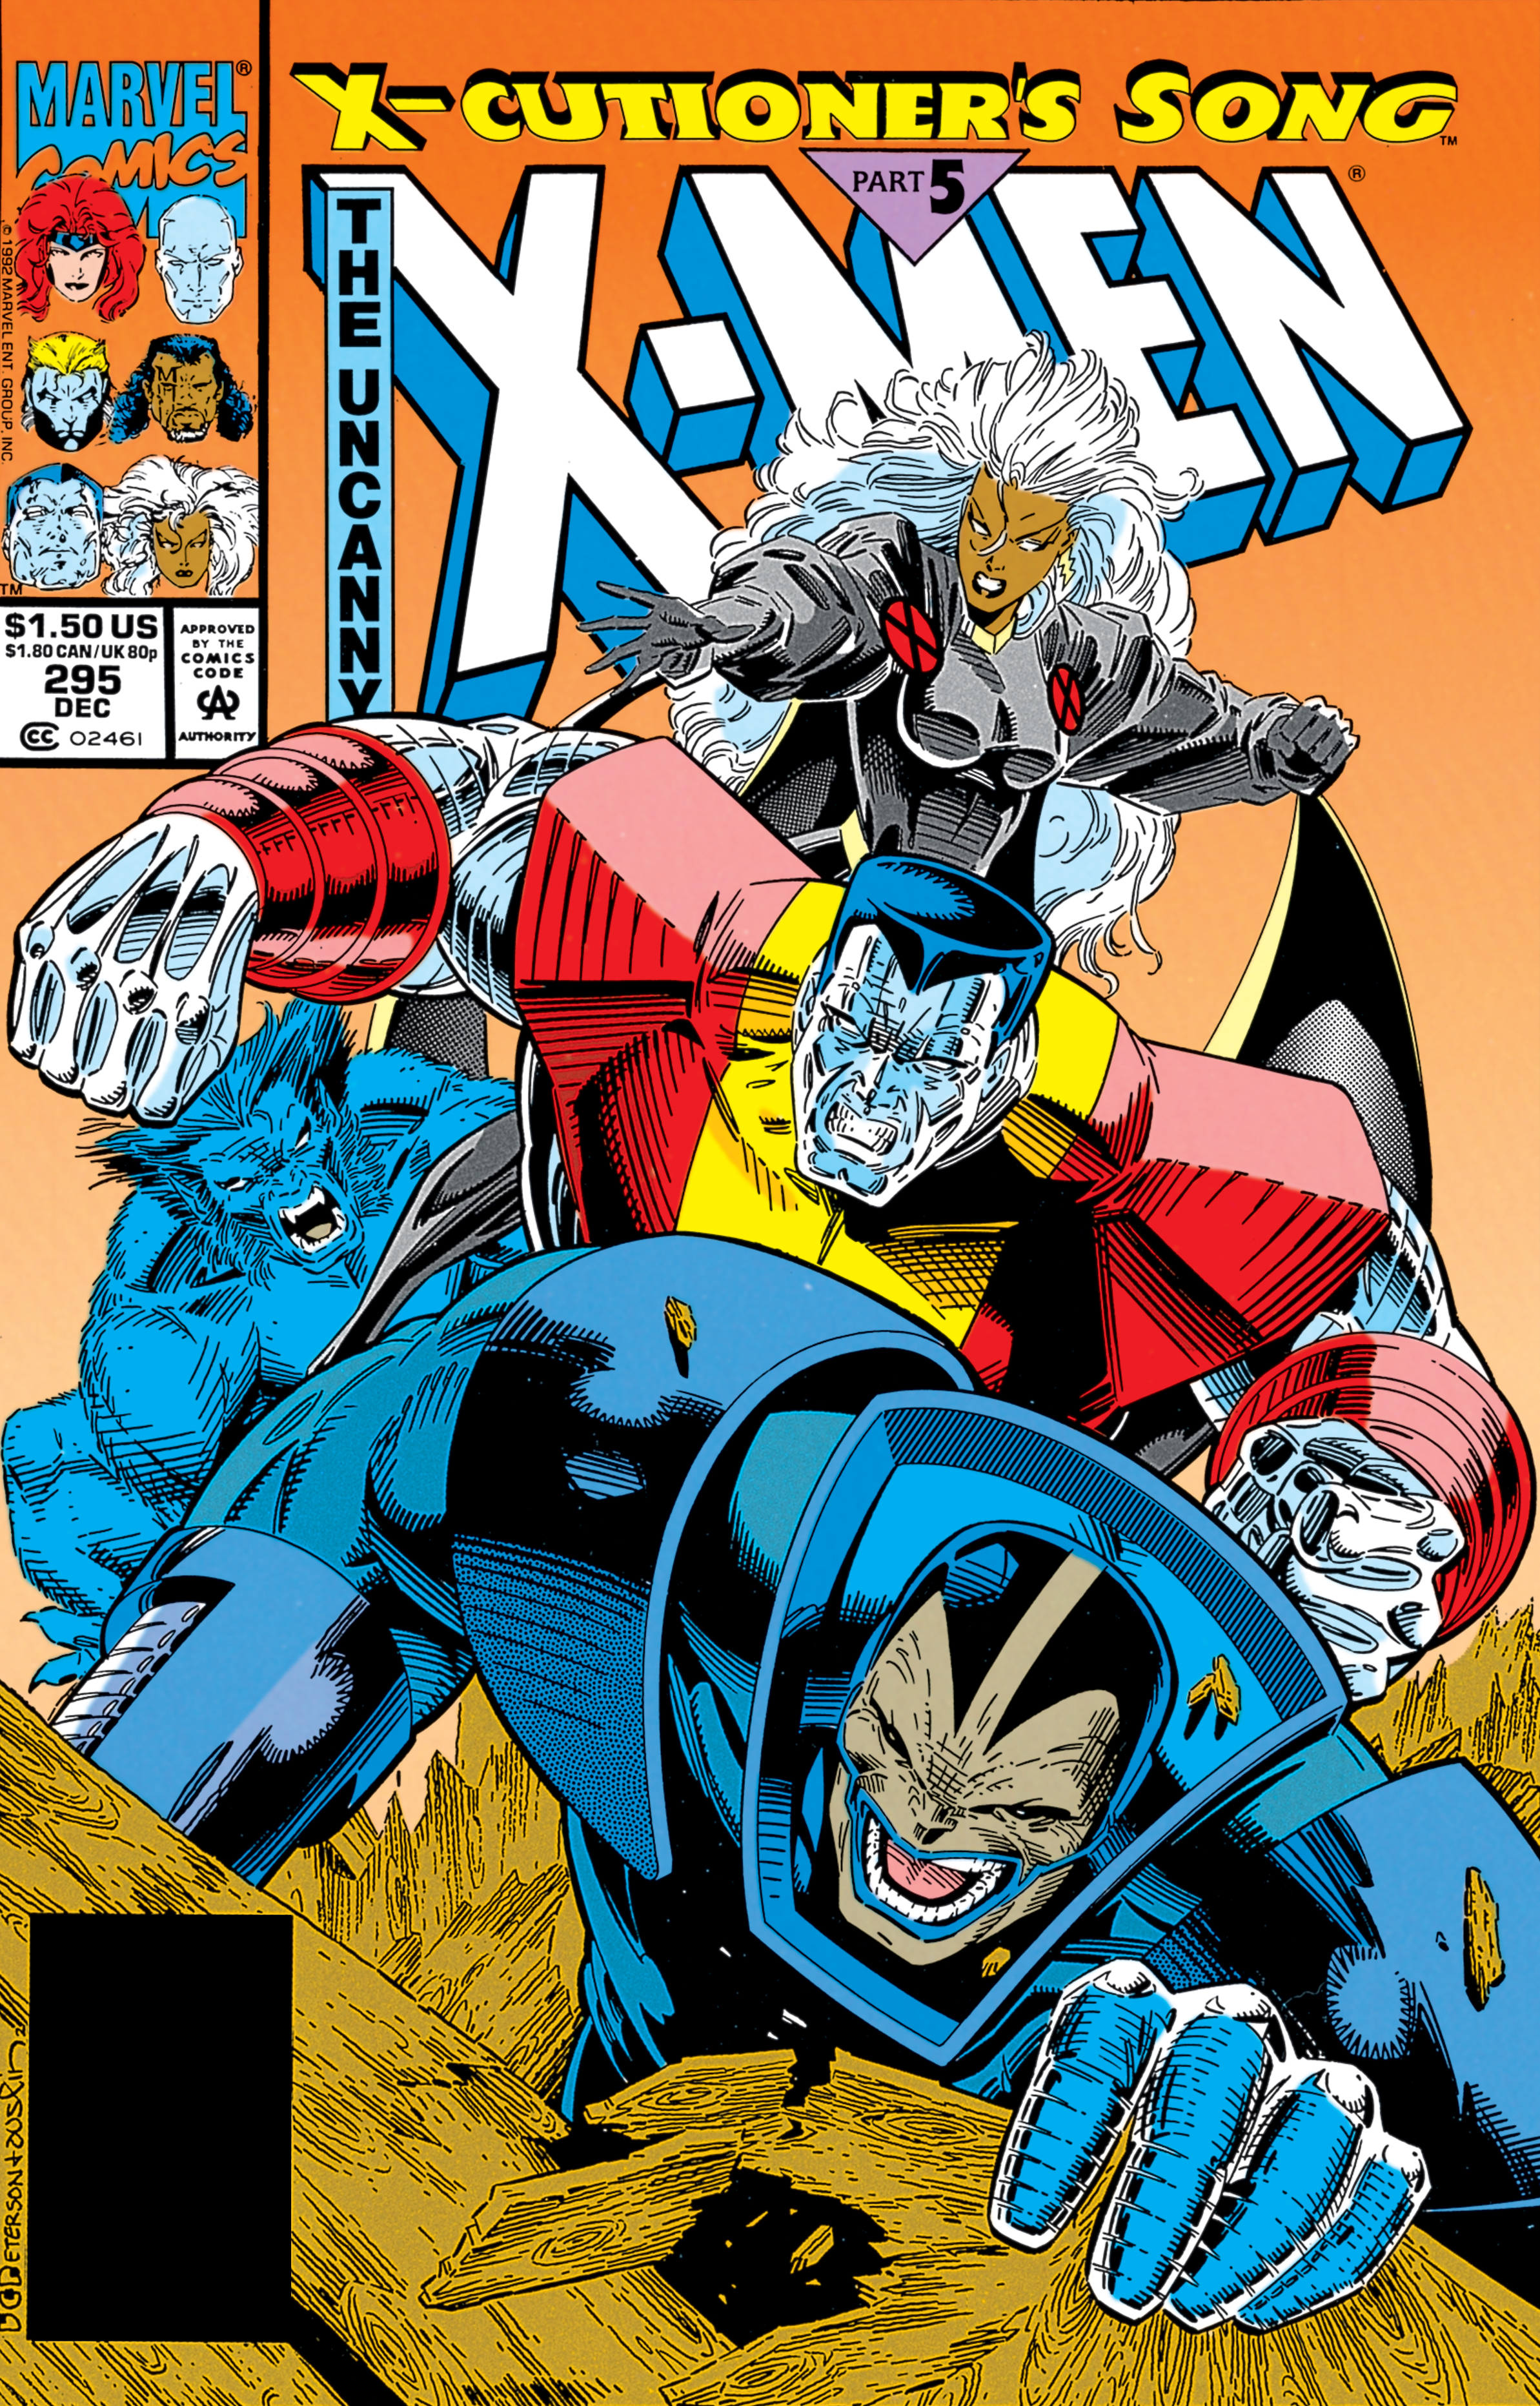 Uncanny X-Men (1963) #295